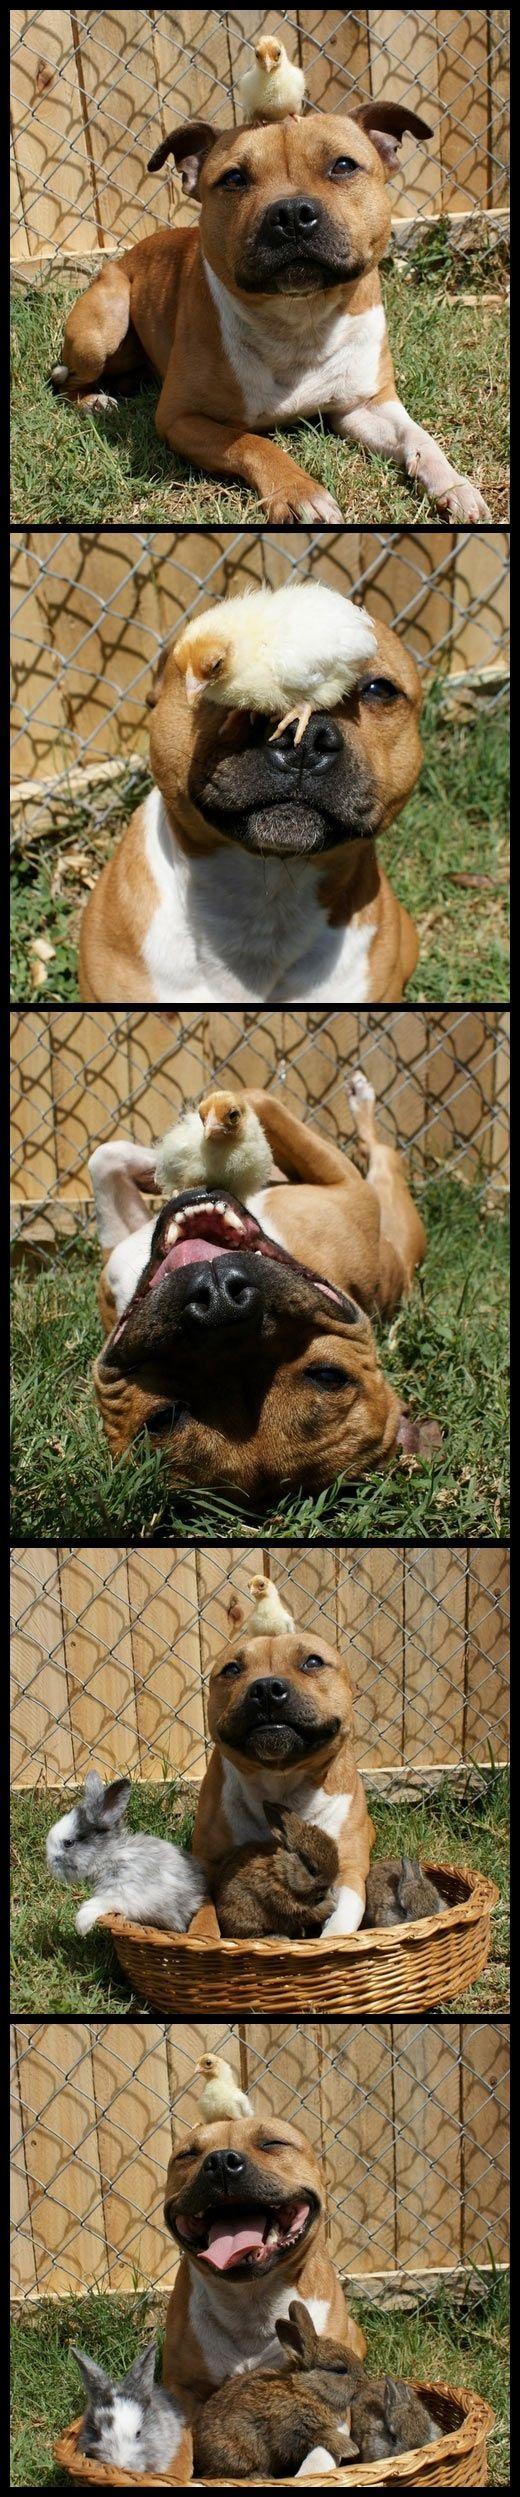 best pet pampering images on pinterest dog cat fluffy pets